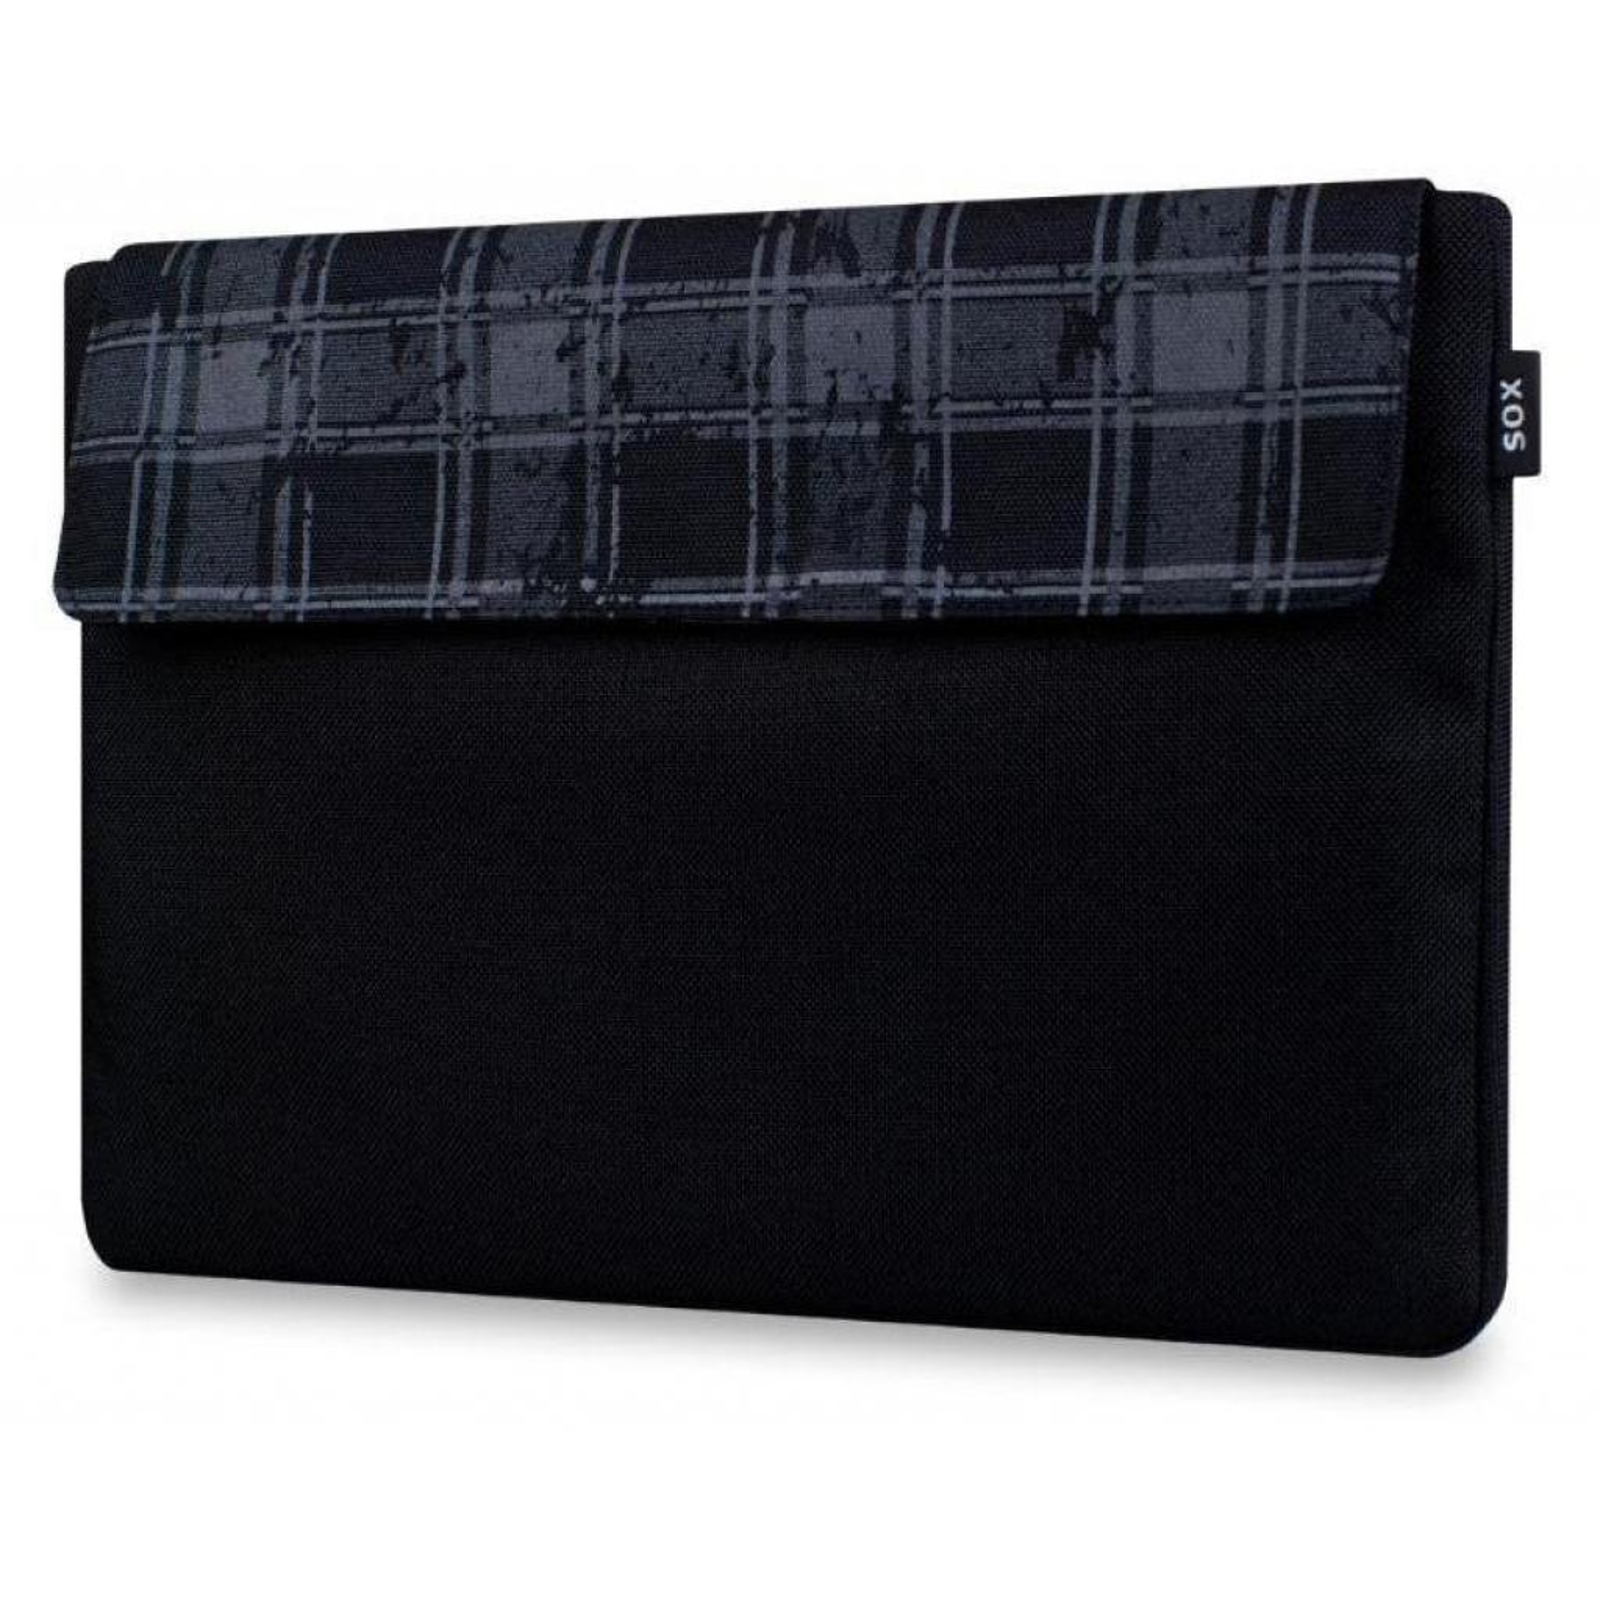 Чехол для планшета SLE CHD1 GX7 Sox